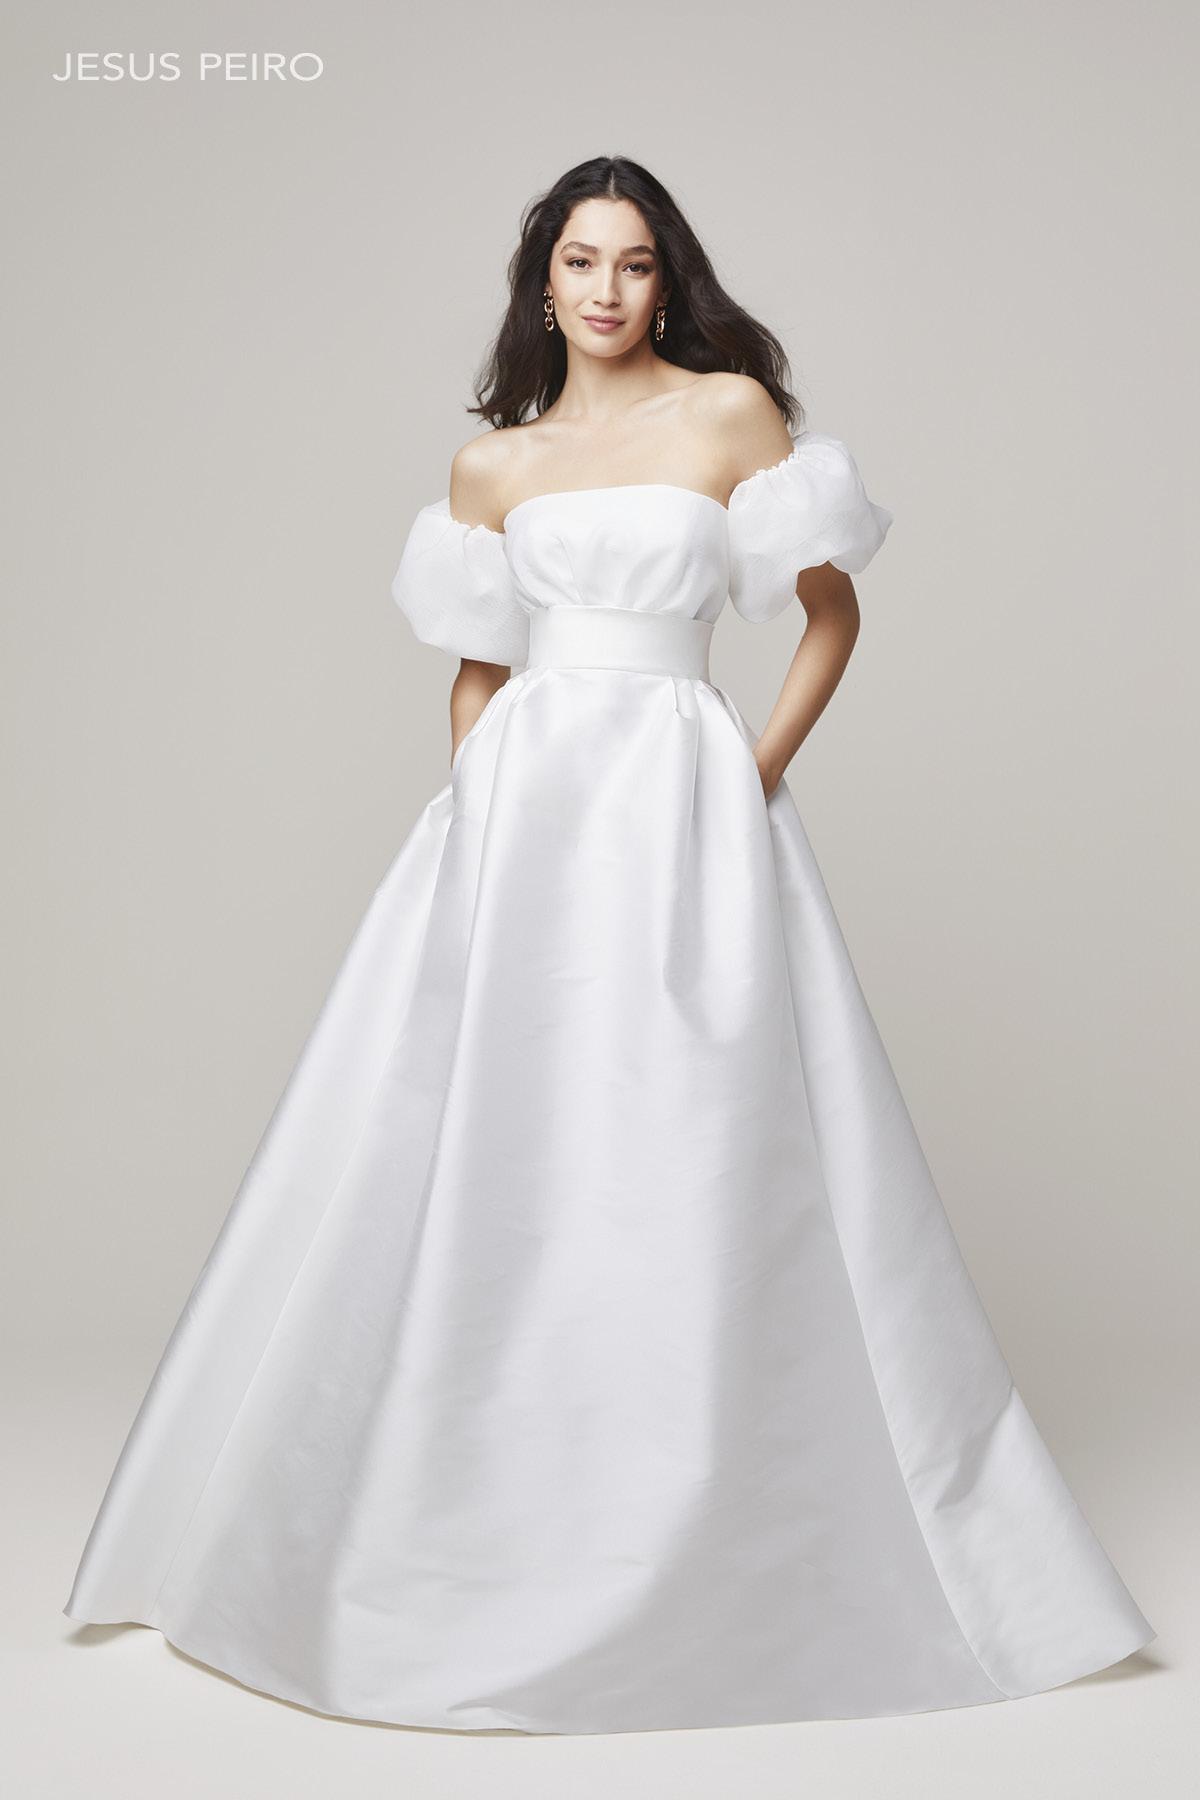 Vestido novia Jesús Peiró Ref.2201